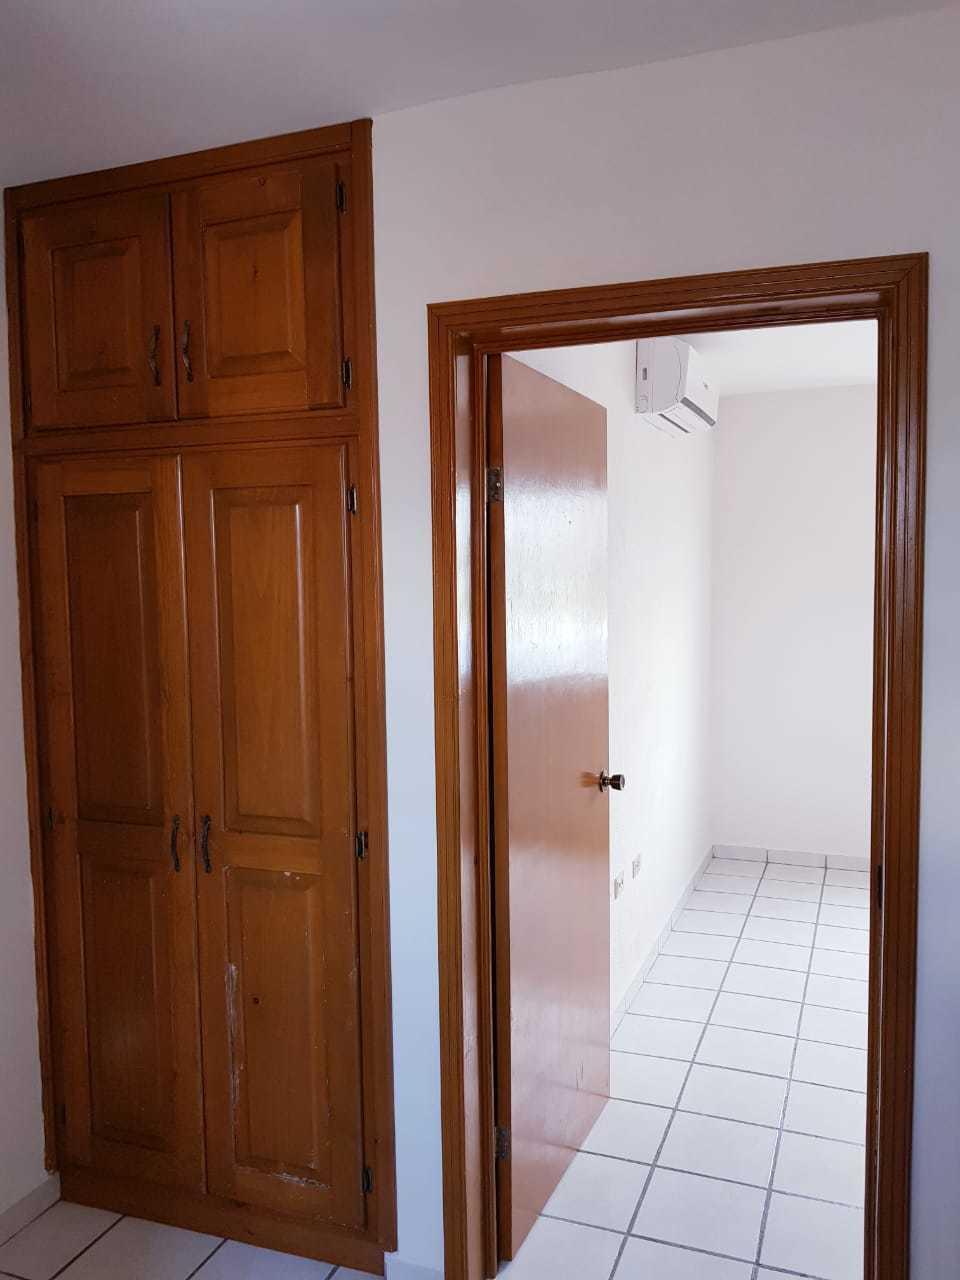 11 de 16: Acceso recamara, closet de blancos